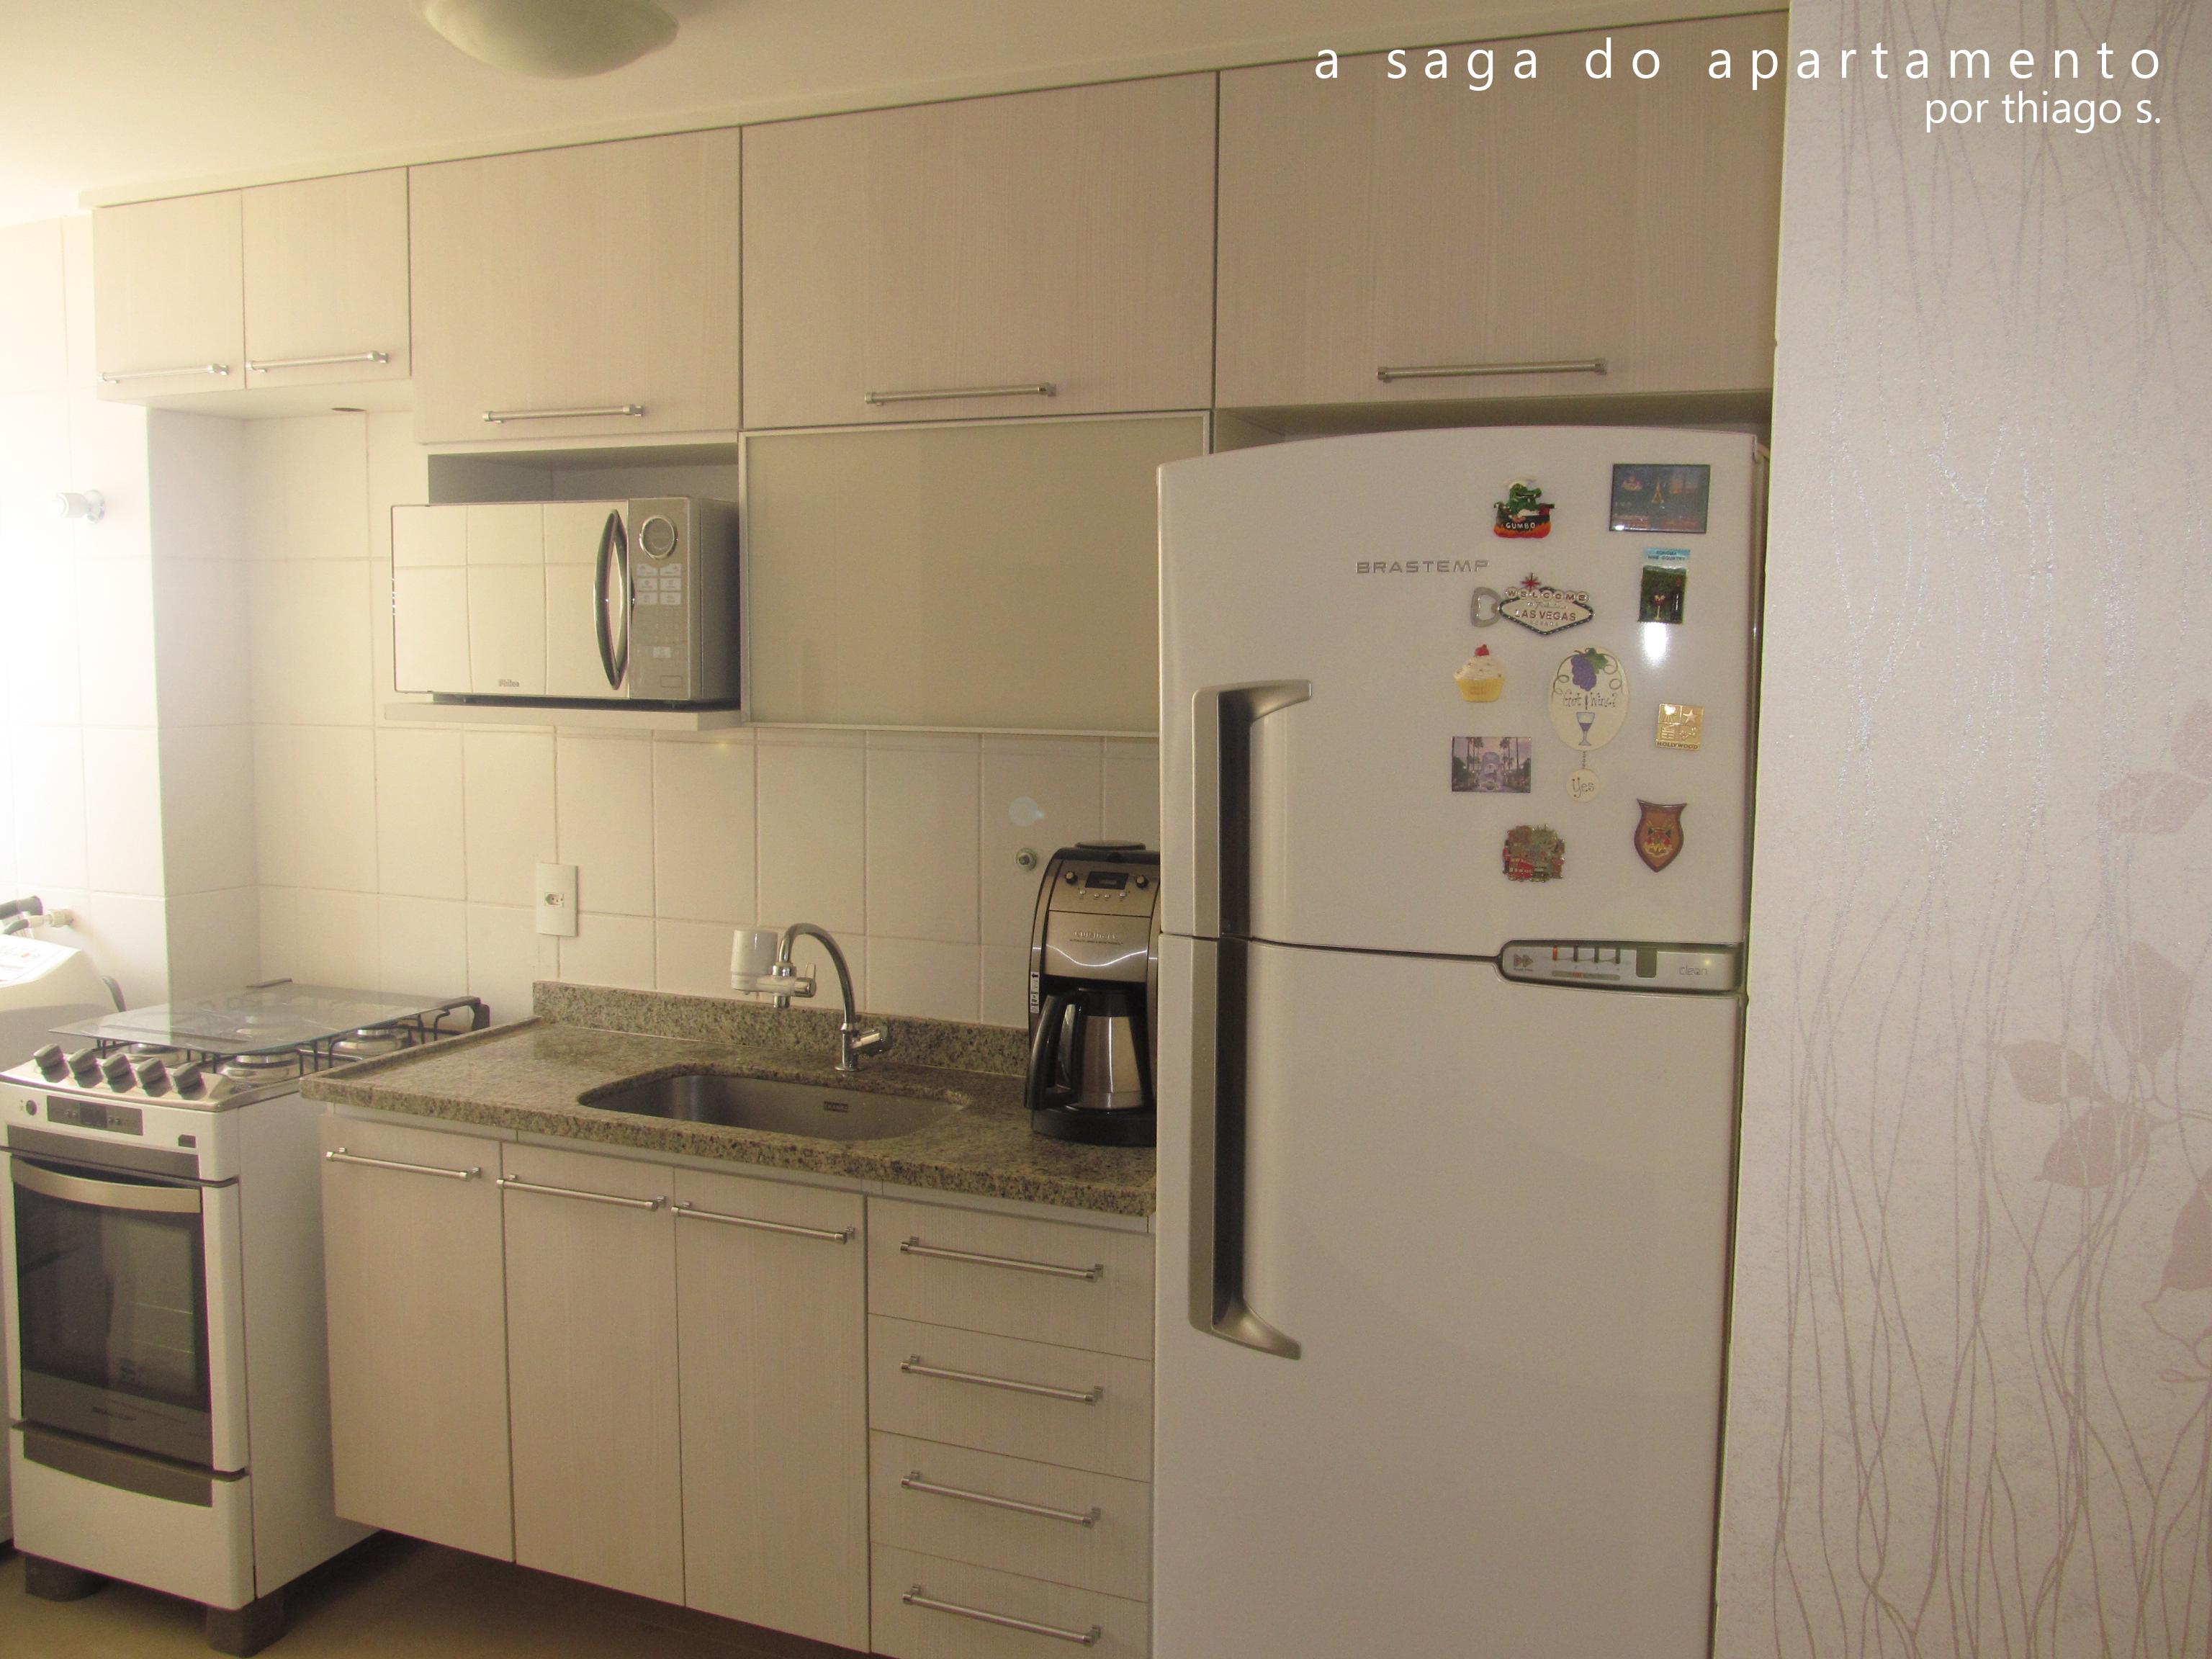 cozinha planejada italínea bon bini cor aspen #90743B 3072 2304